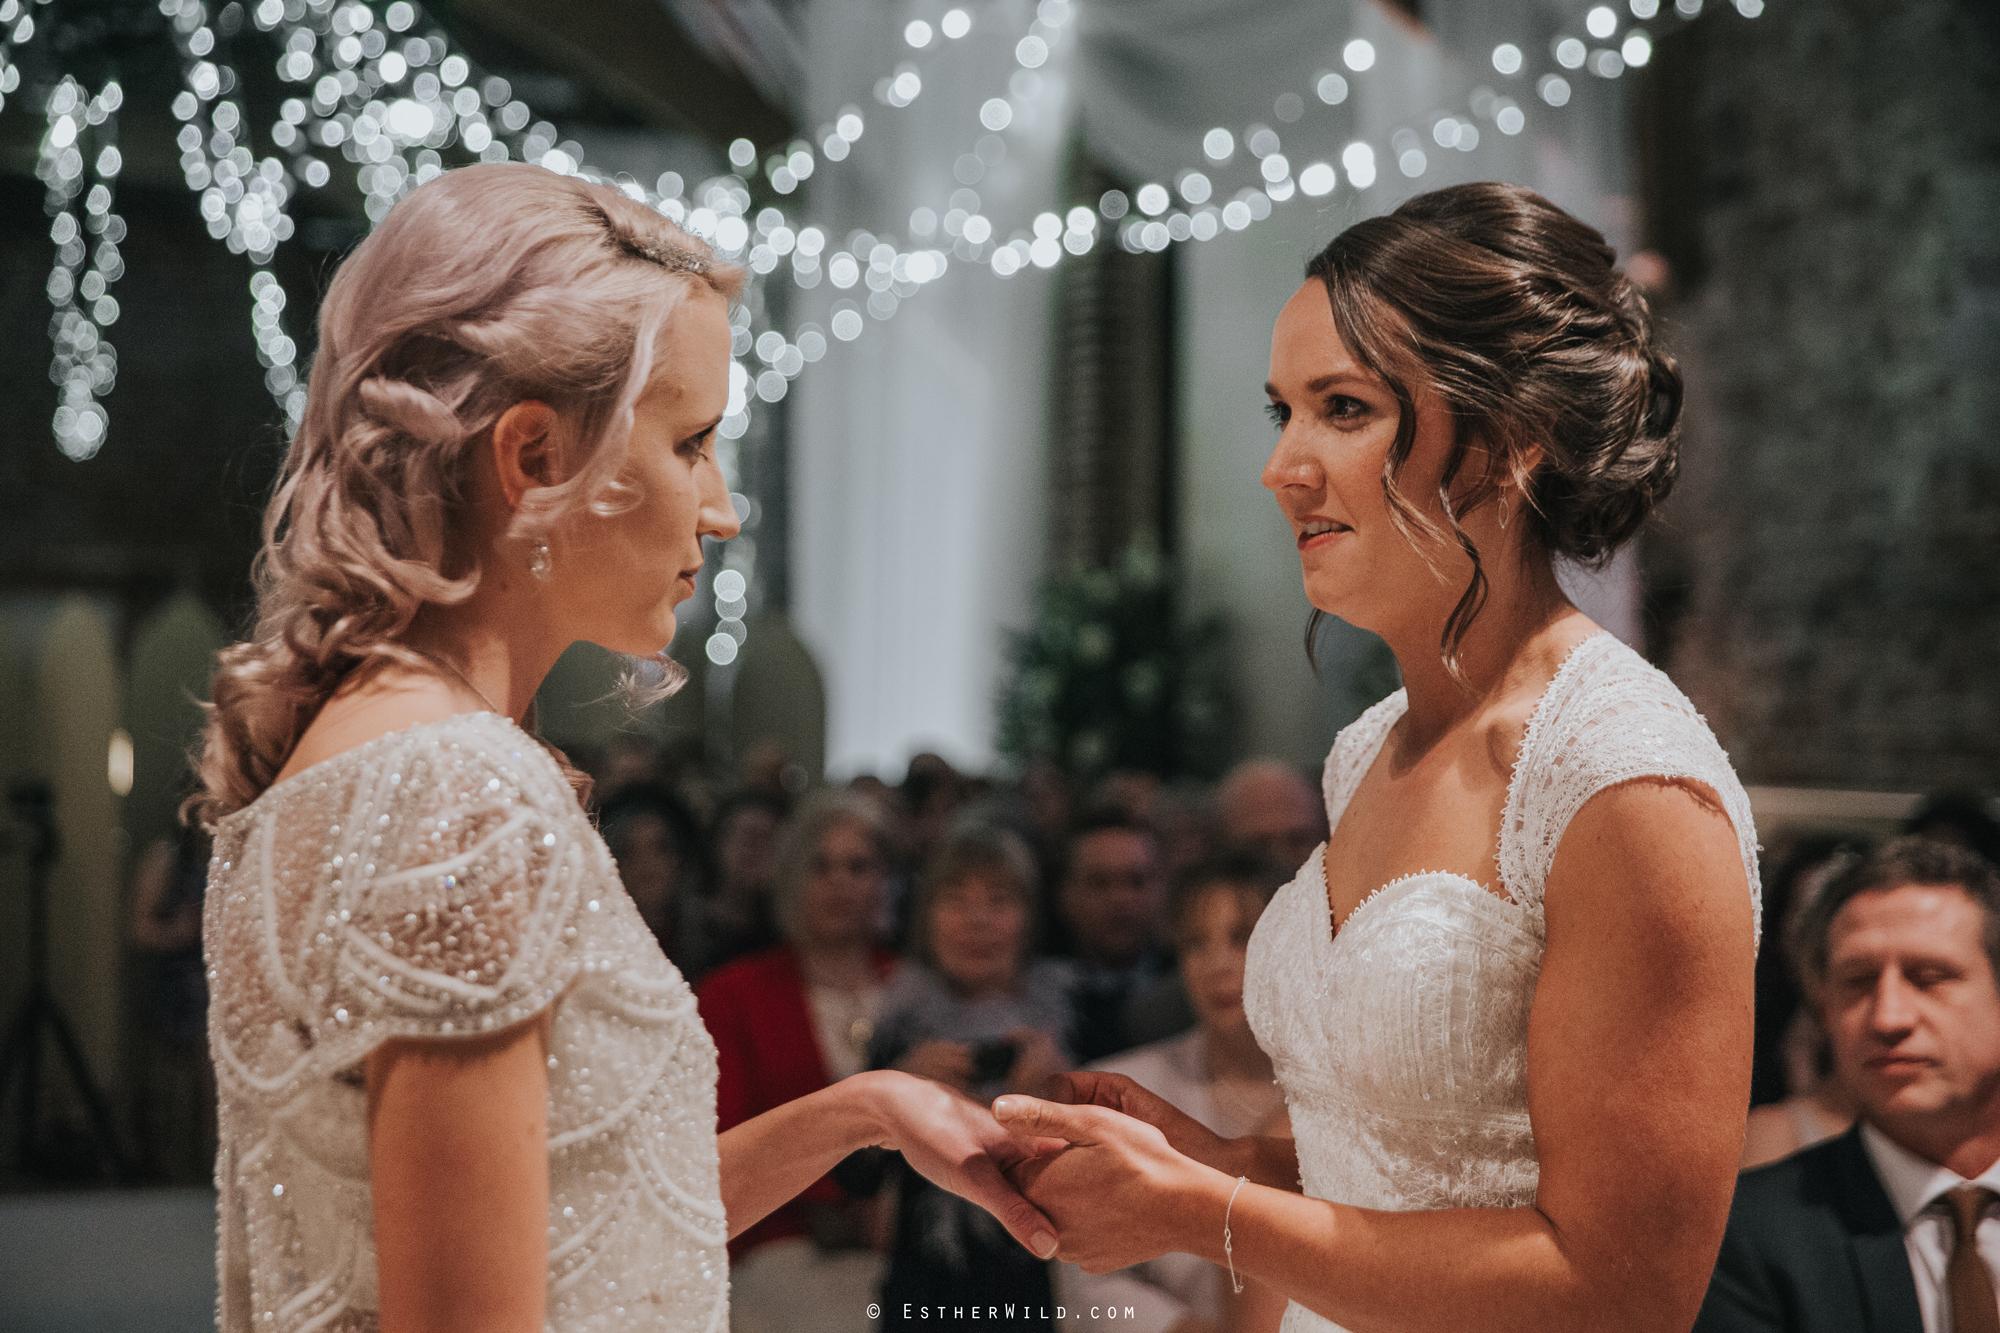 Elms_Barn_Weddings_Suffolk_Photographer_Copyright_Esther_Wild_IMG_1243.jpg